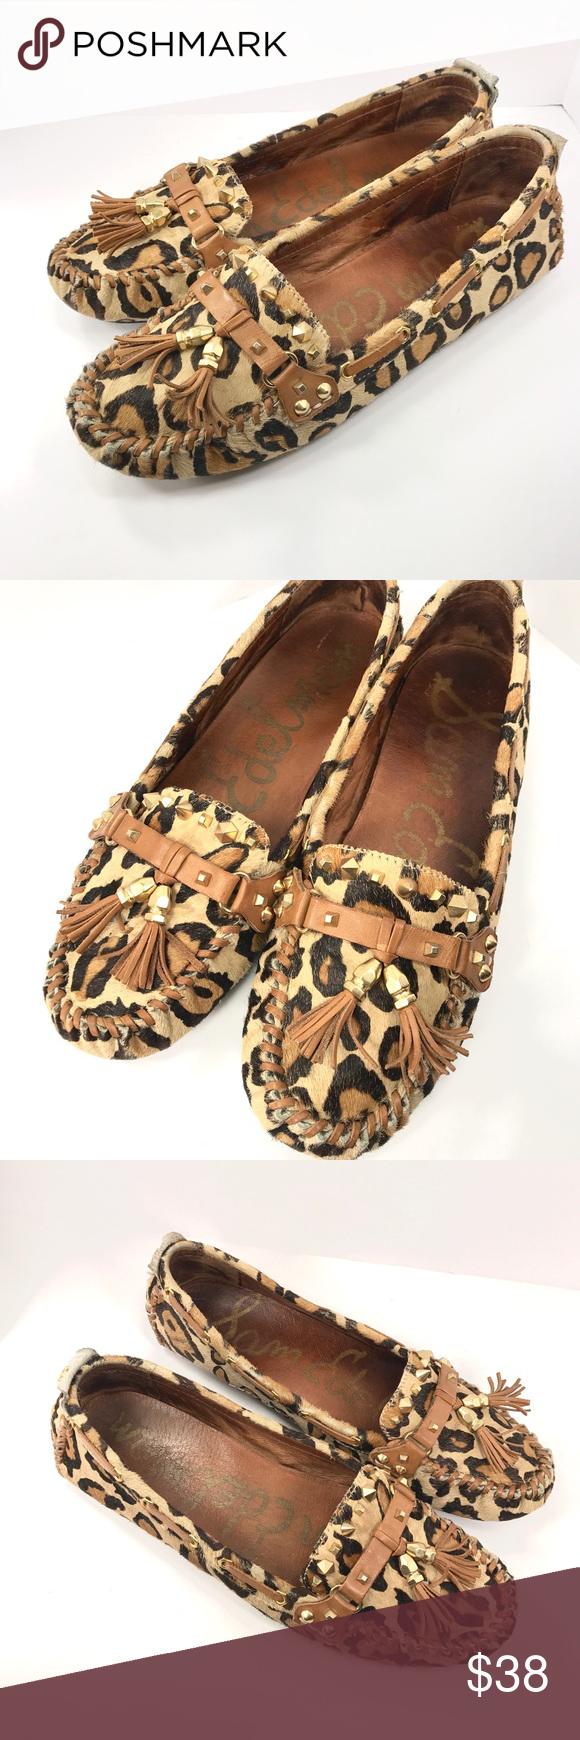 6dd70ebd1932 Sam Edelman Leopard Print Loafers Sam Edelman leather upper brahma hair leopard  print loafer shoes size